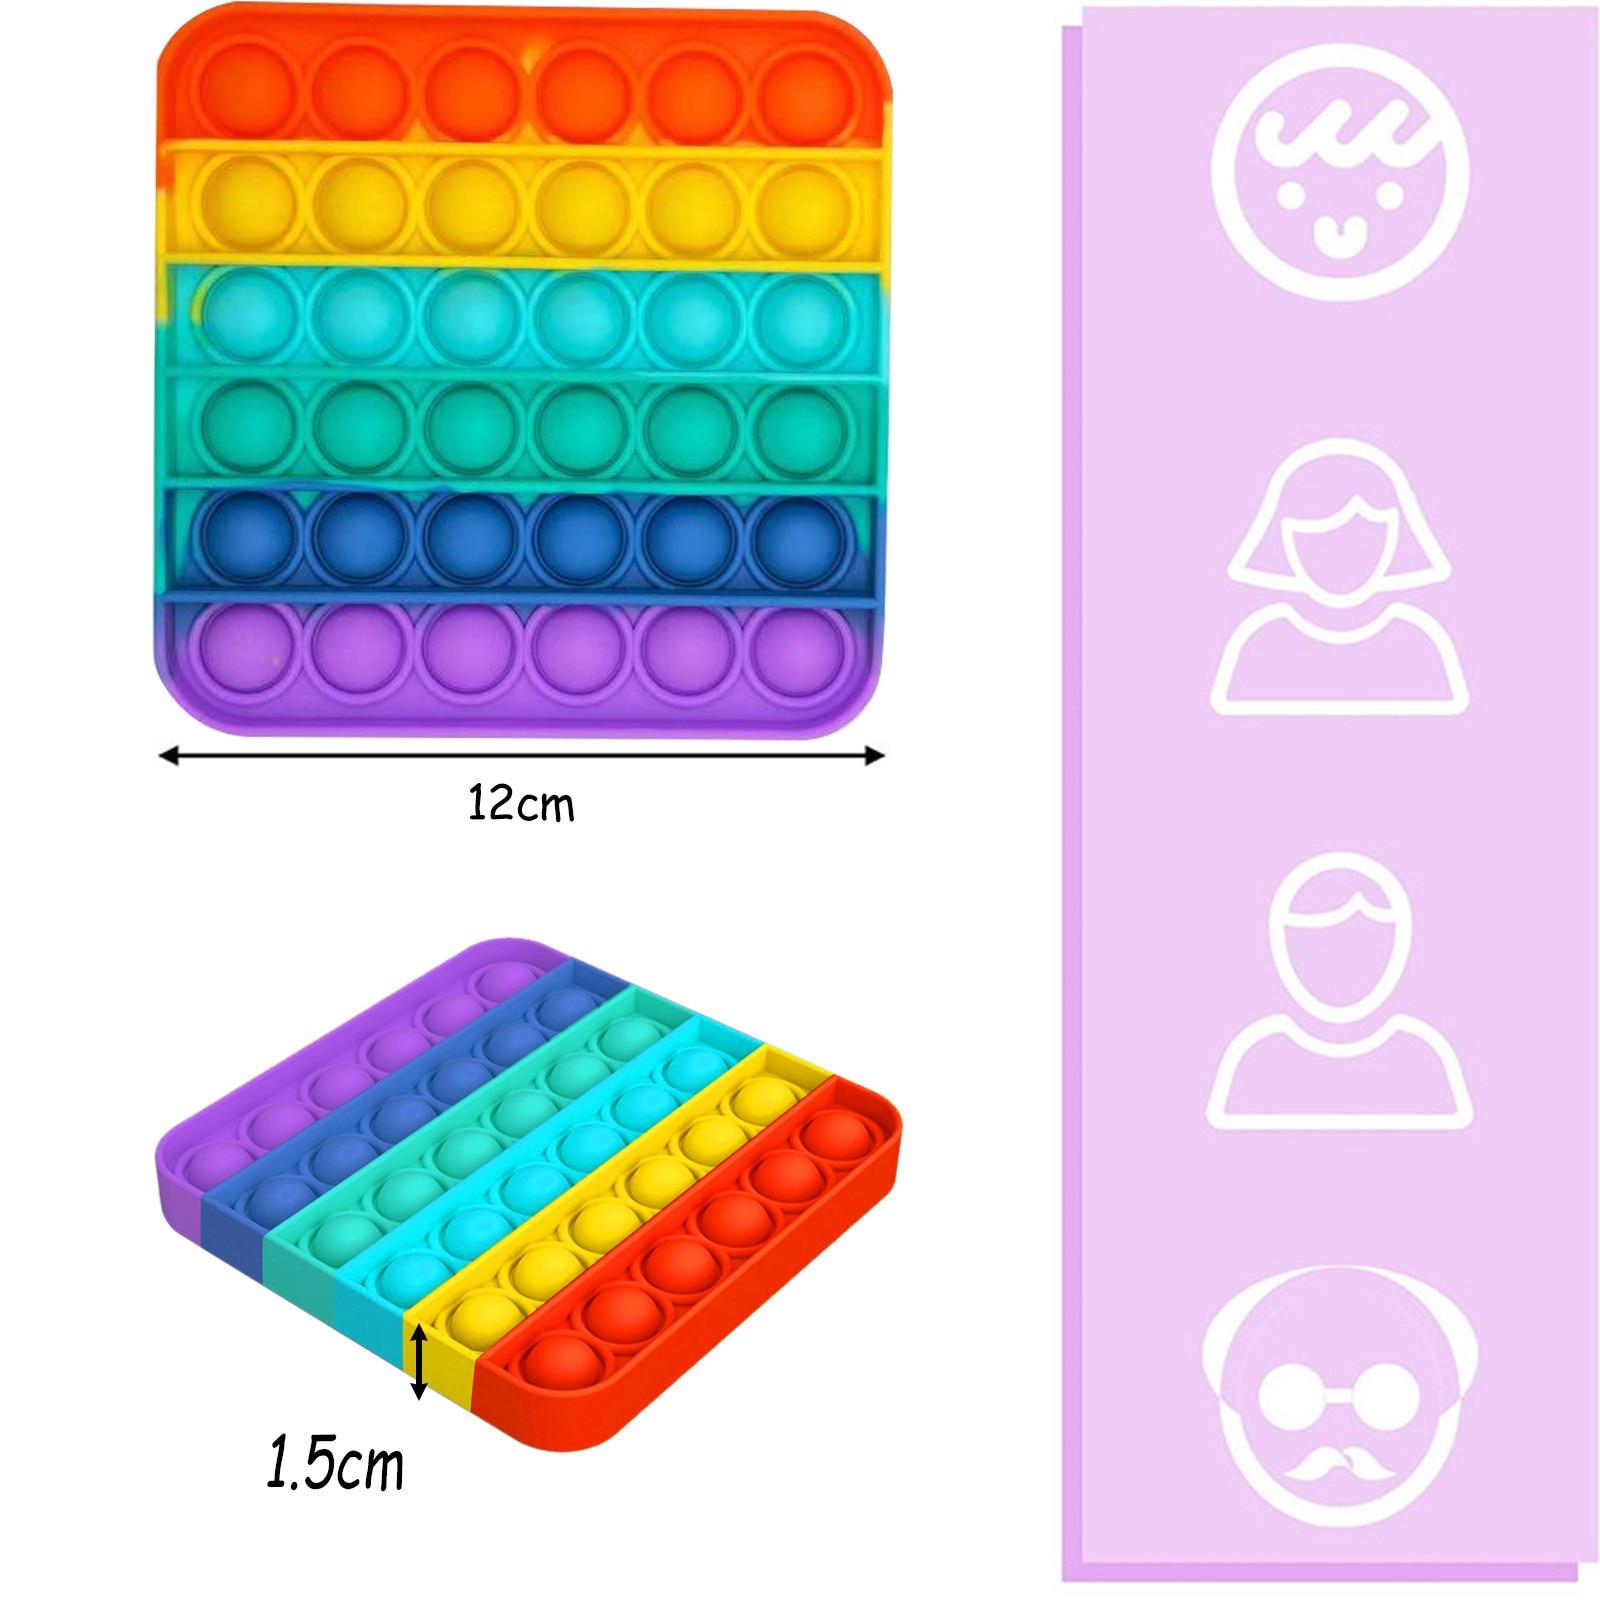 Fitget-Toys Sensory-Toy Autism Fidget Needs-Stress Pop-It-Game Push Bubble Reliever Popoit img3